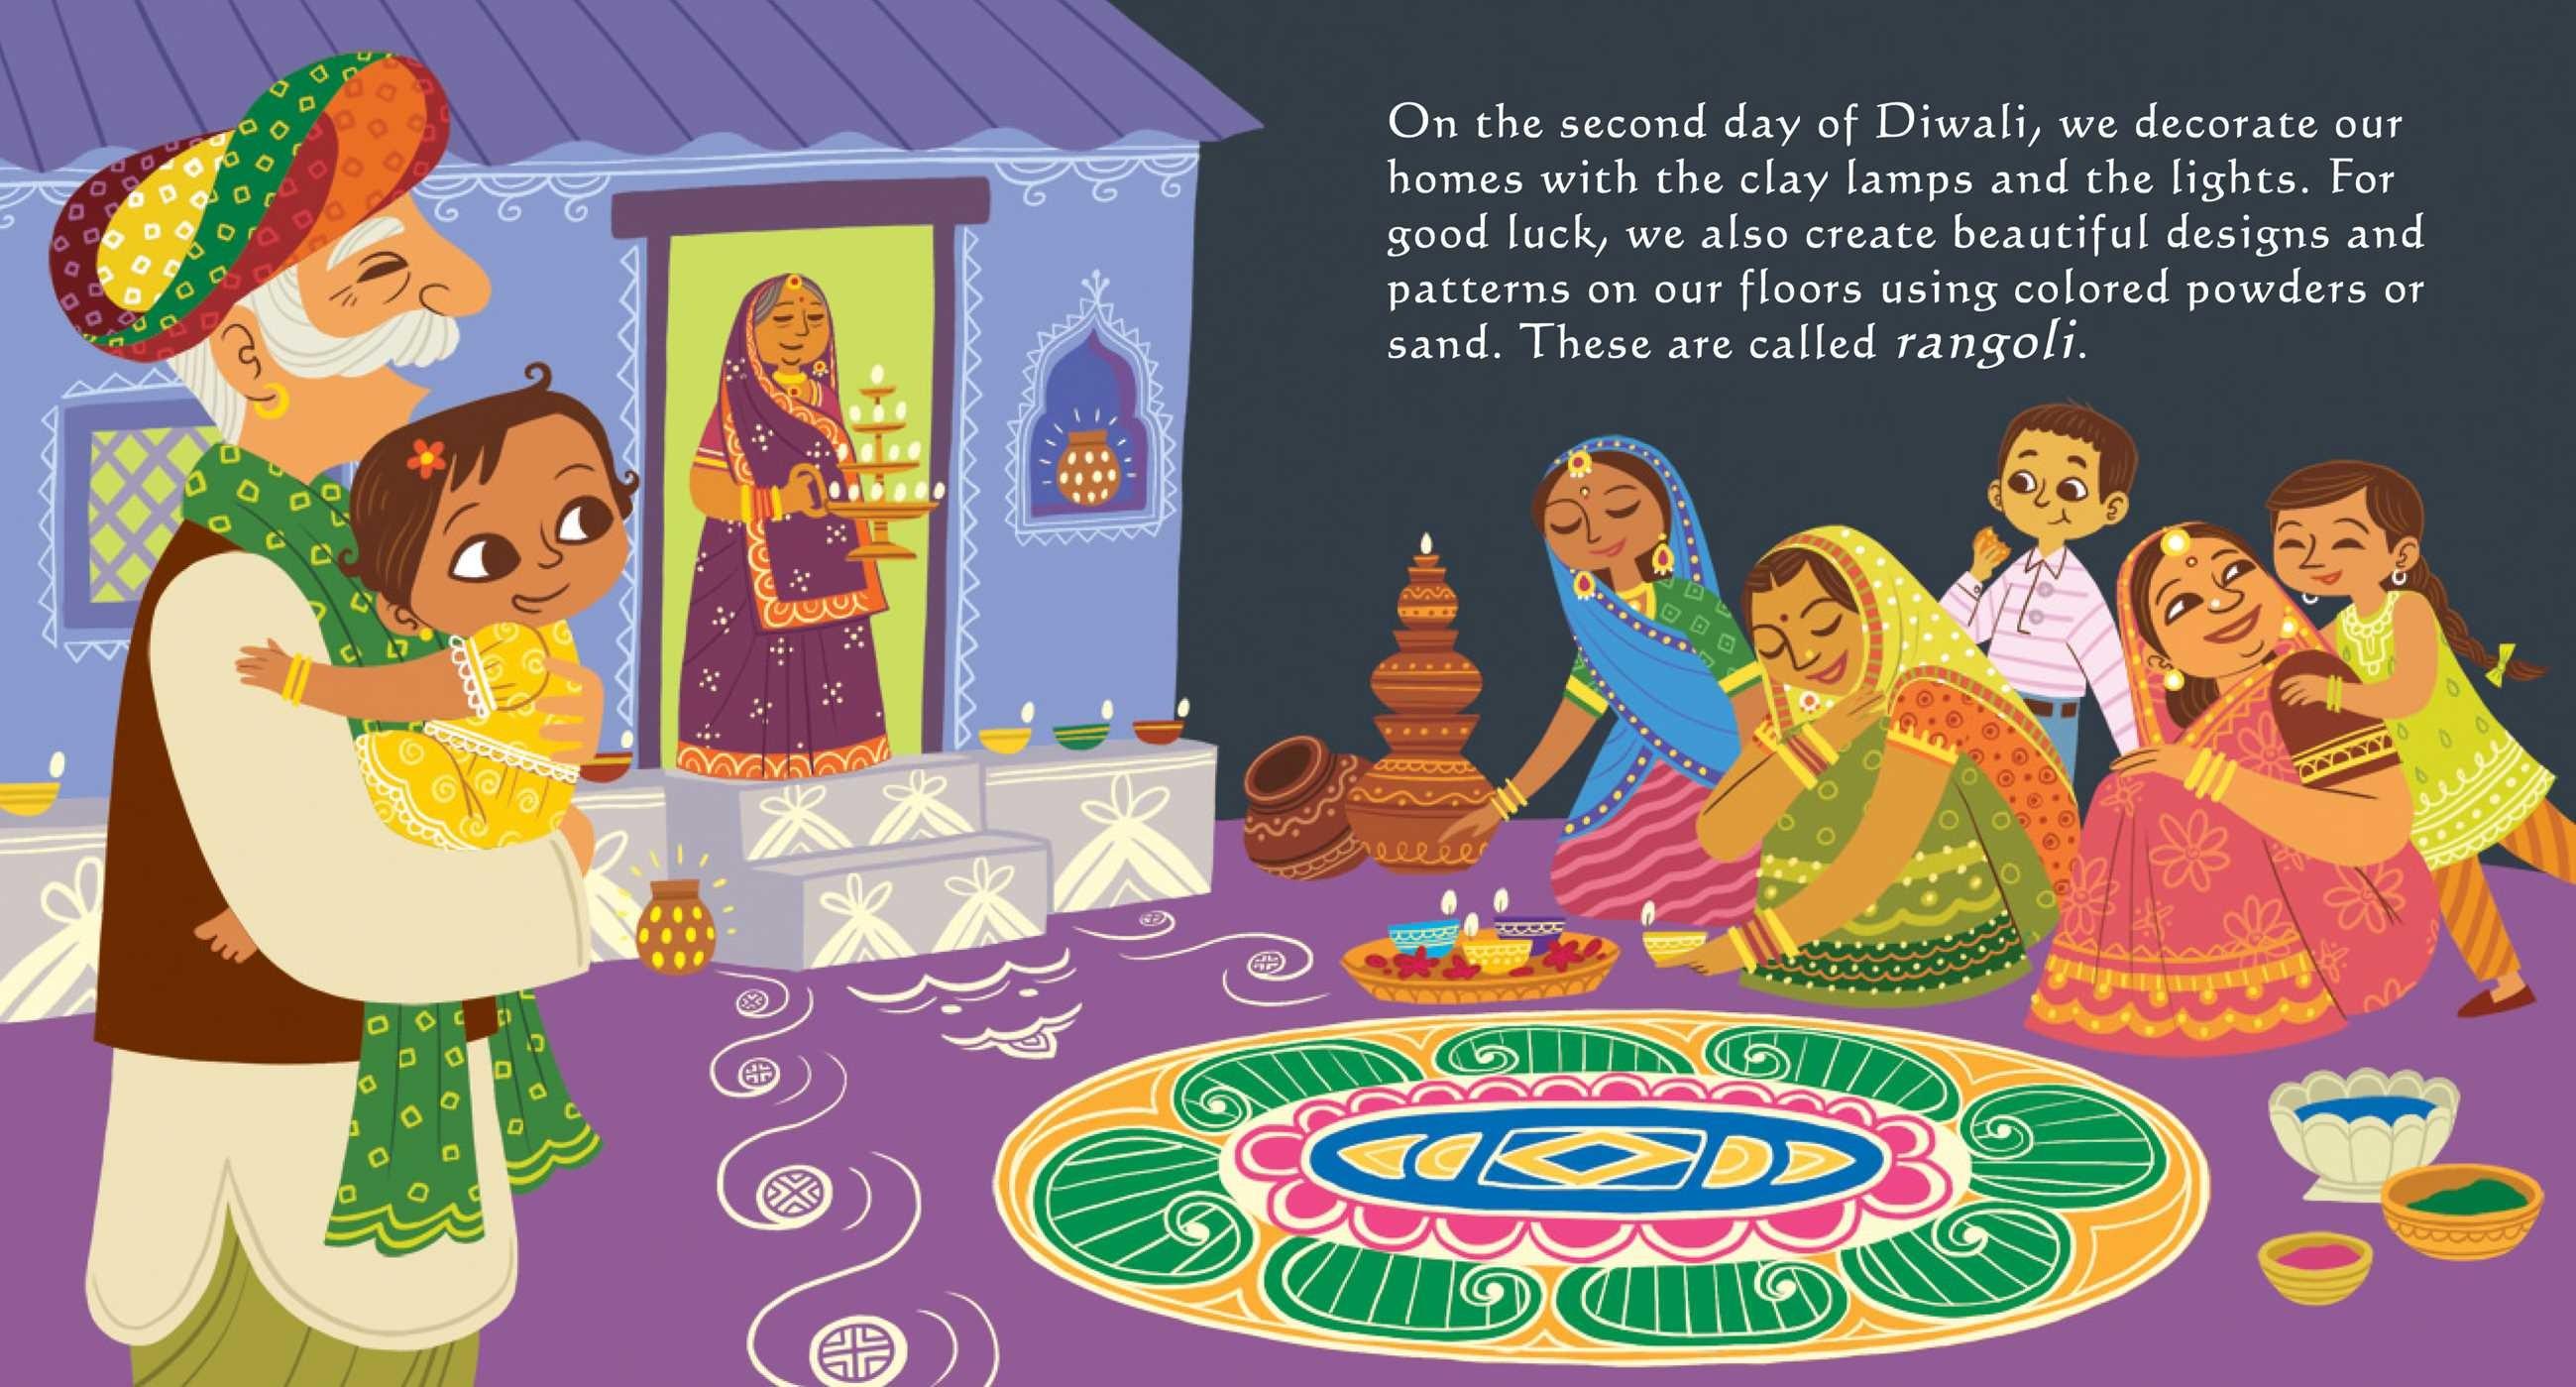 Diwali 9781534419902.in04